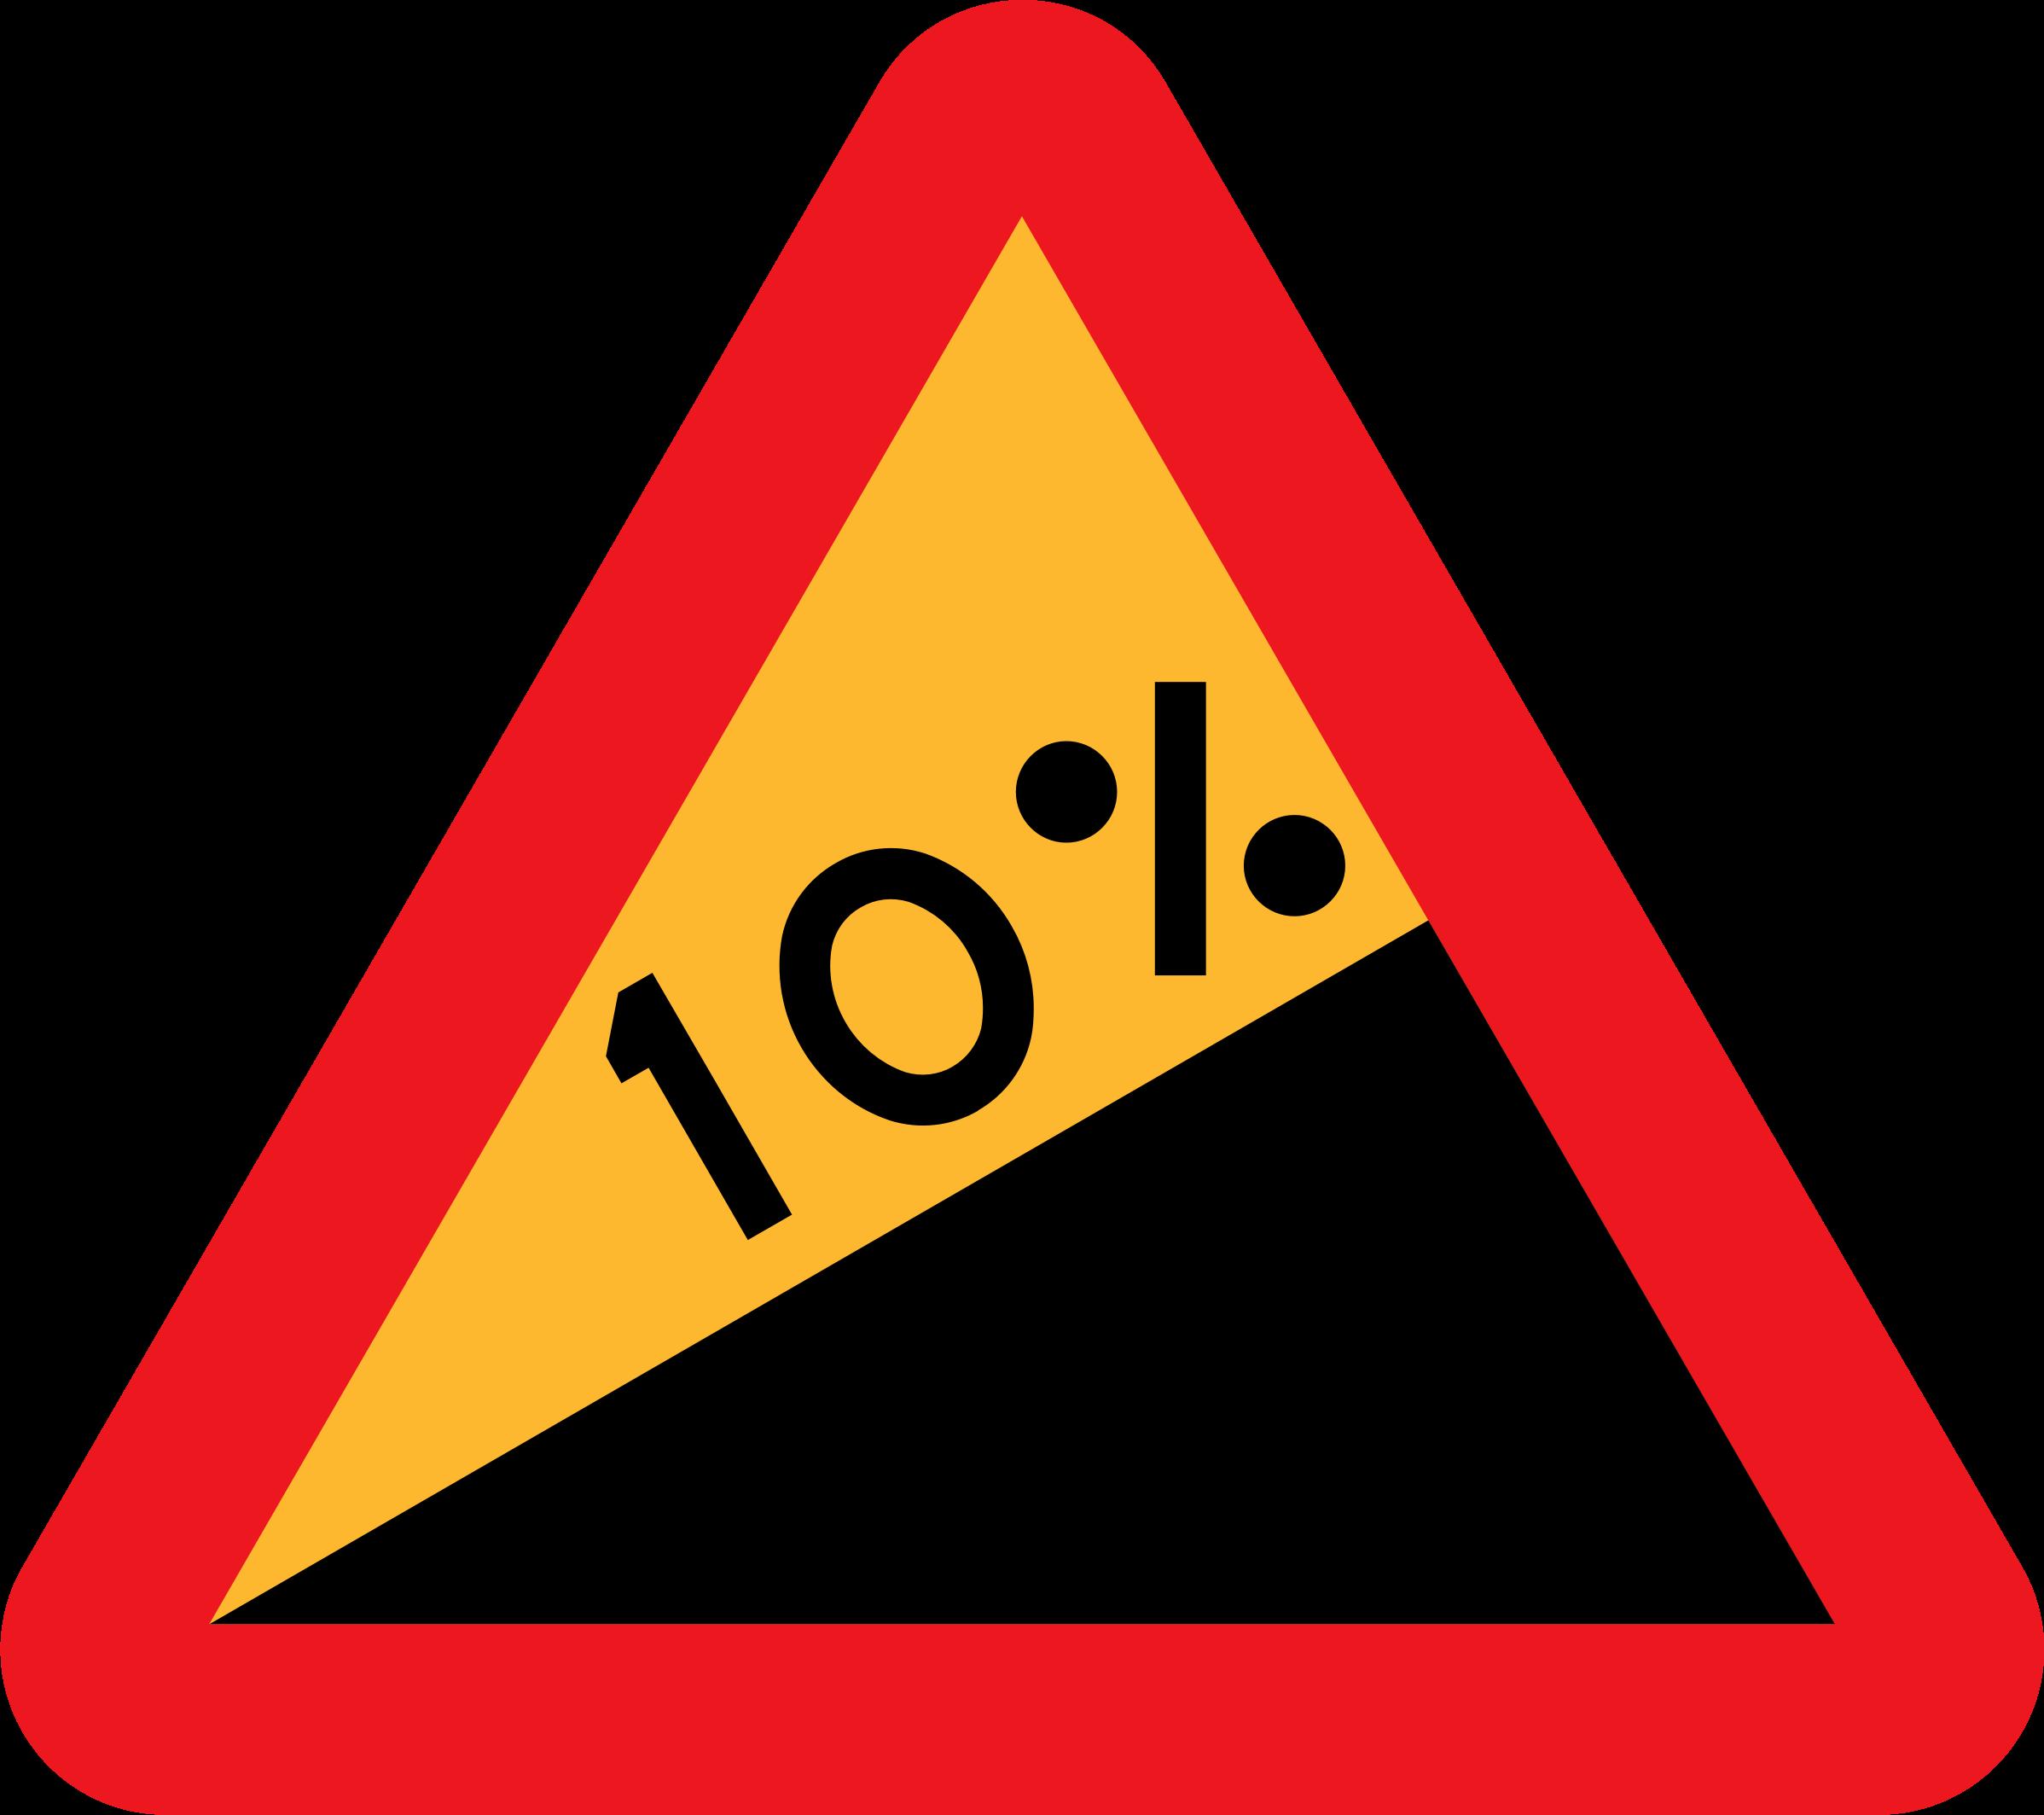 Clipart 10 Upward Gradient Roadsign